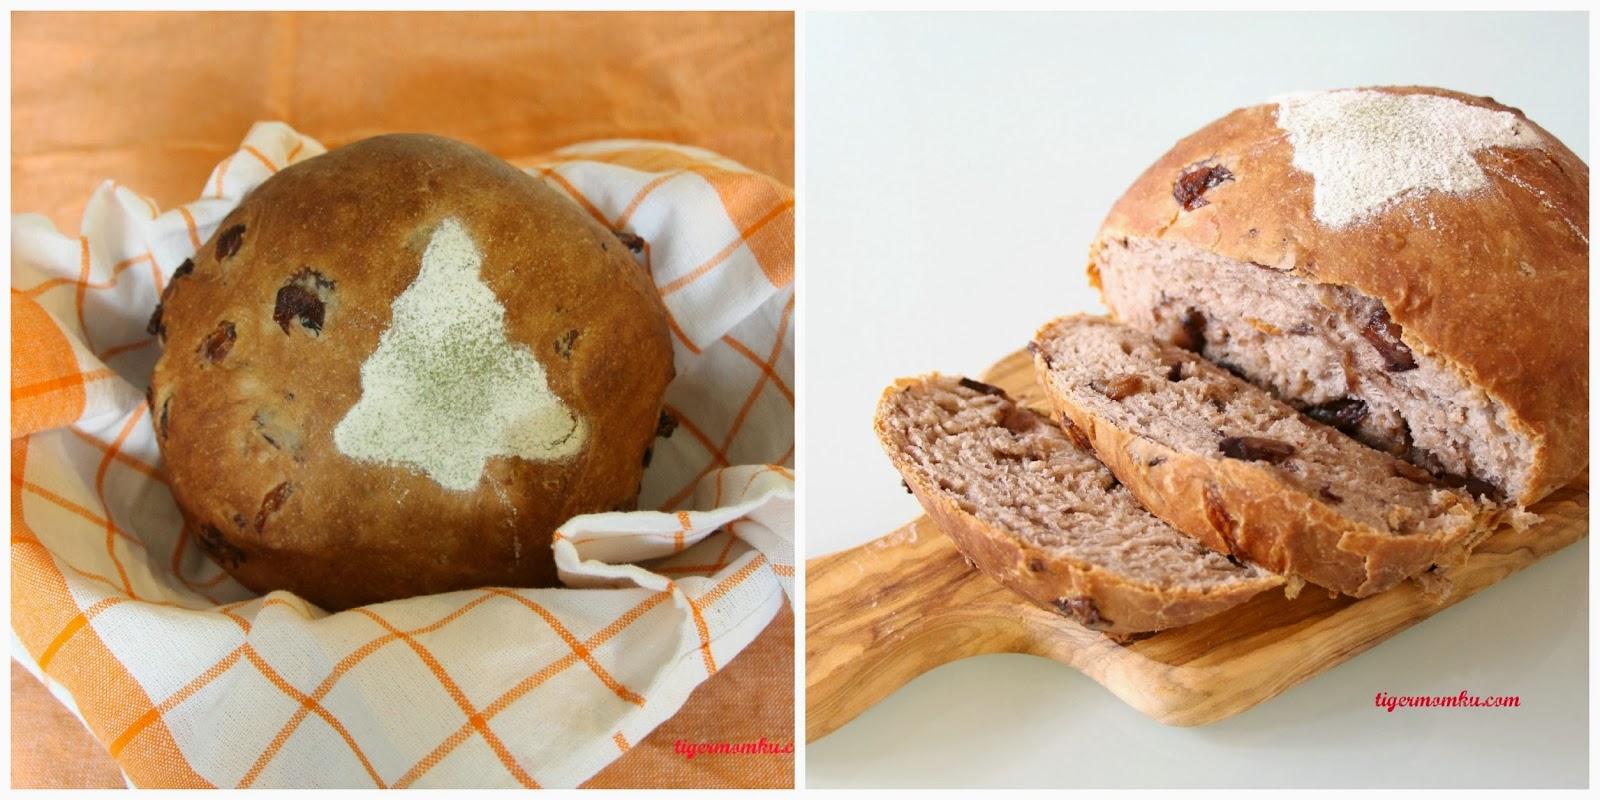 TIGERMOMKU: 紅酒桂圓麵包